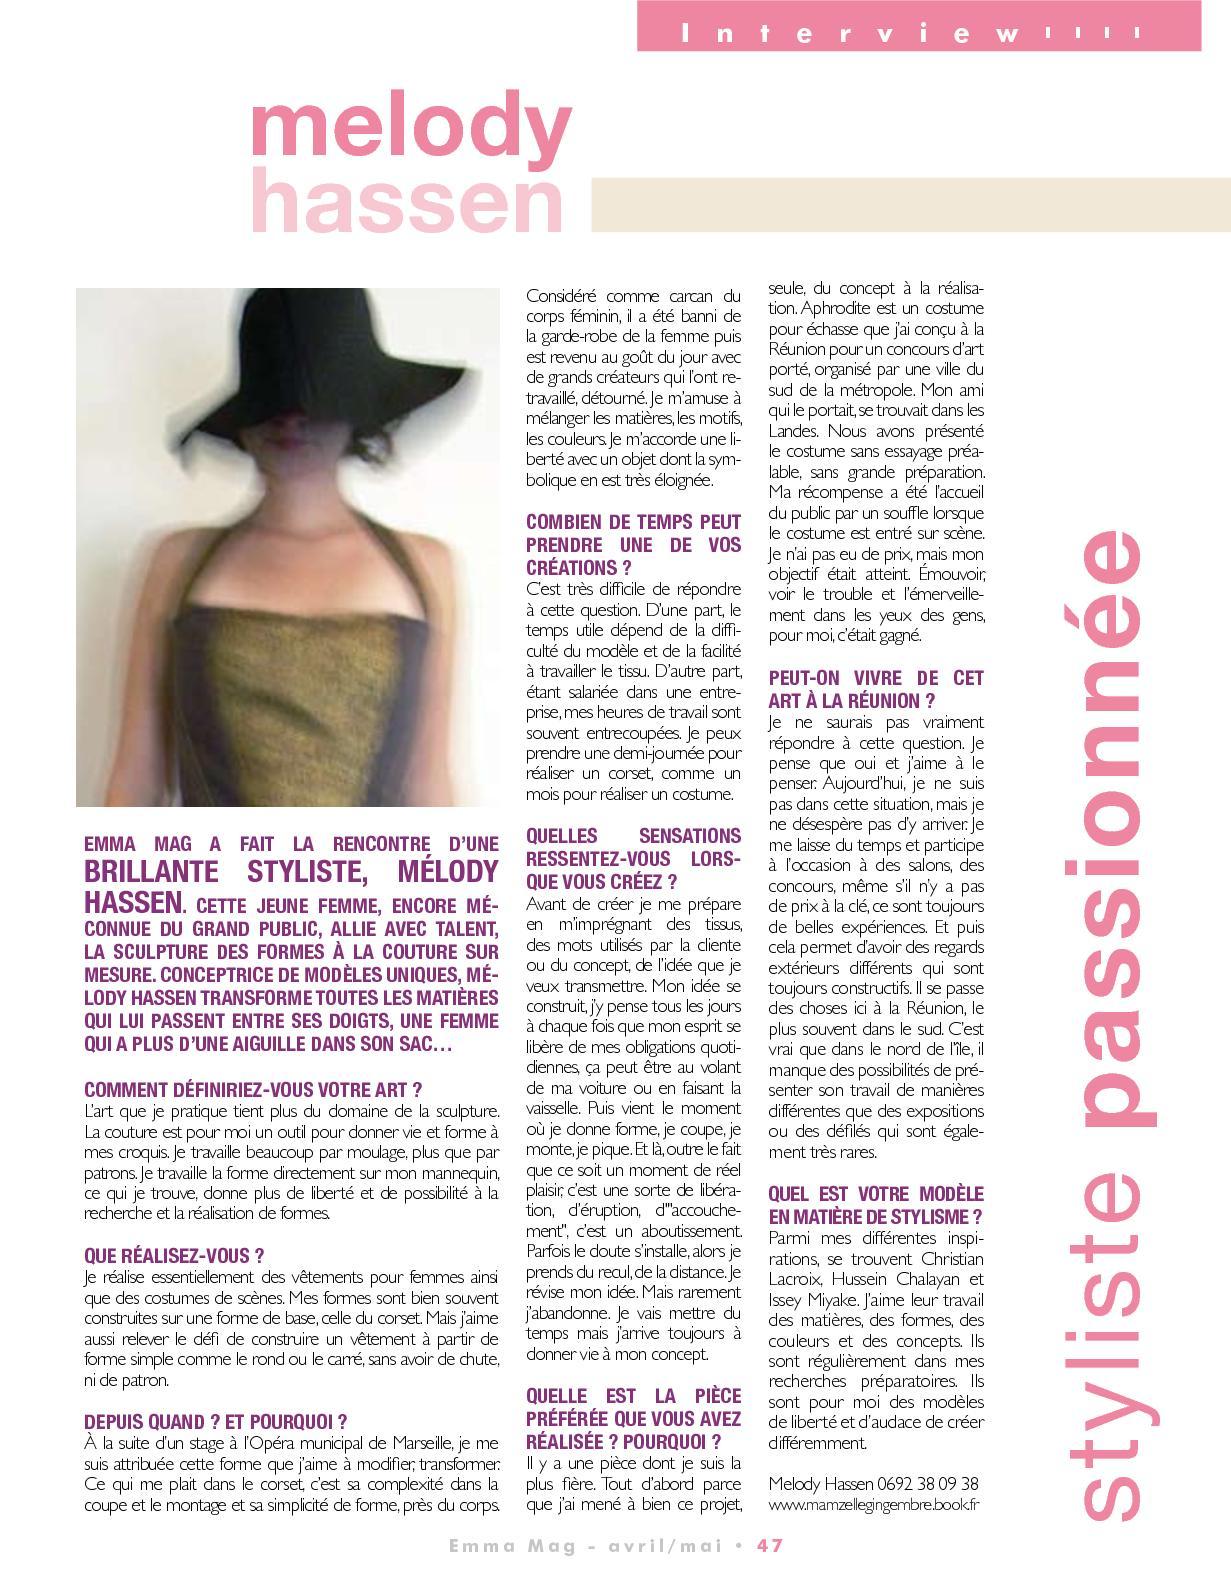 Garde Du Corps Marseille emma mag #22 - calameo downloader